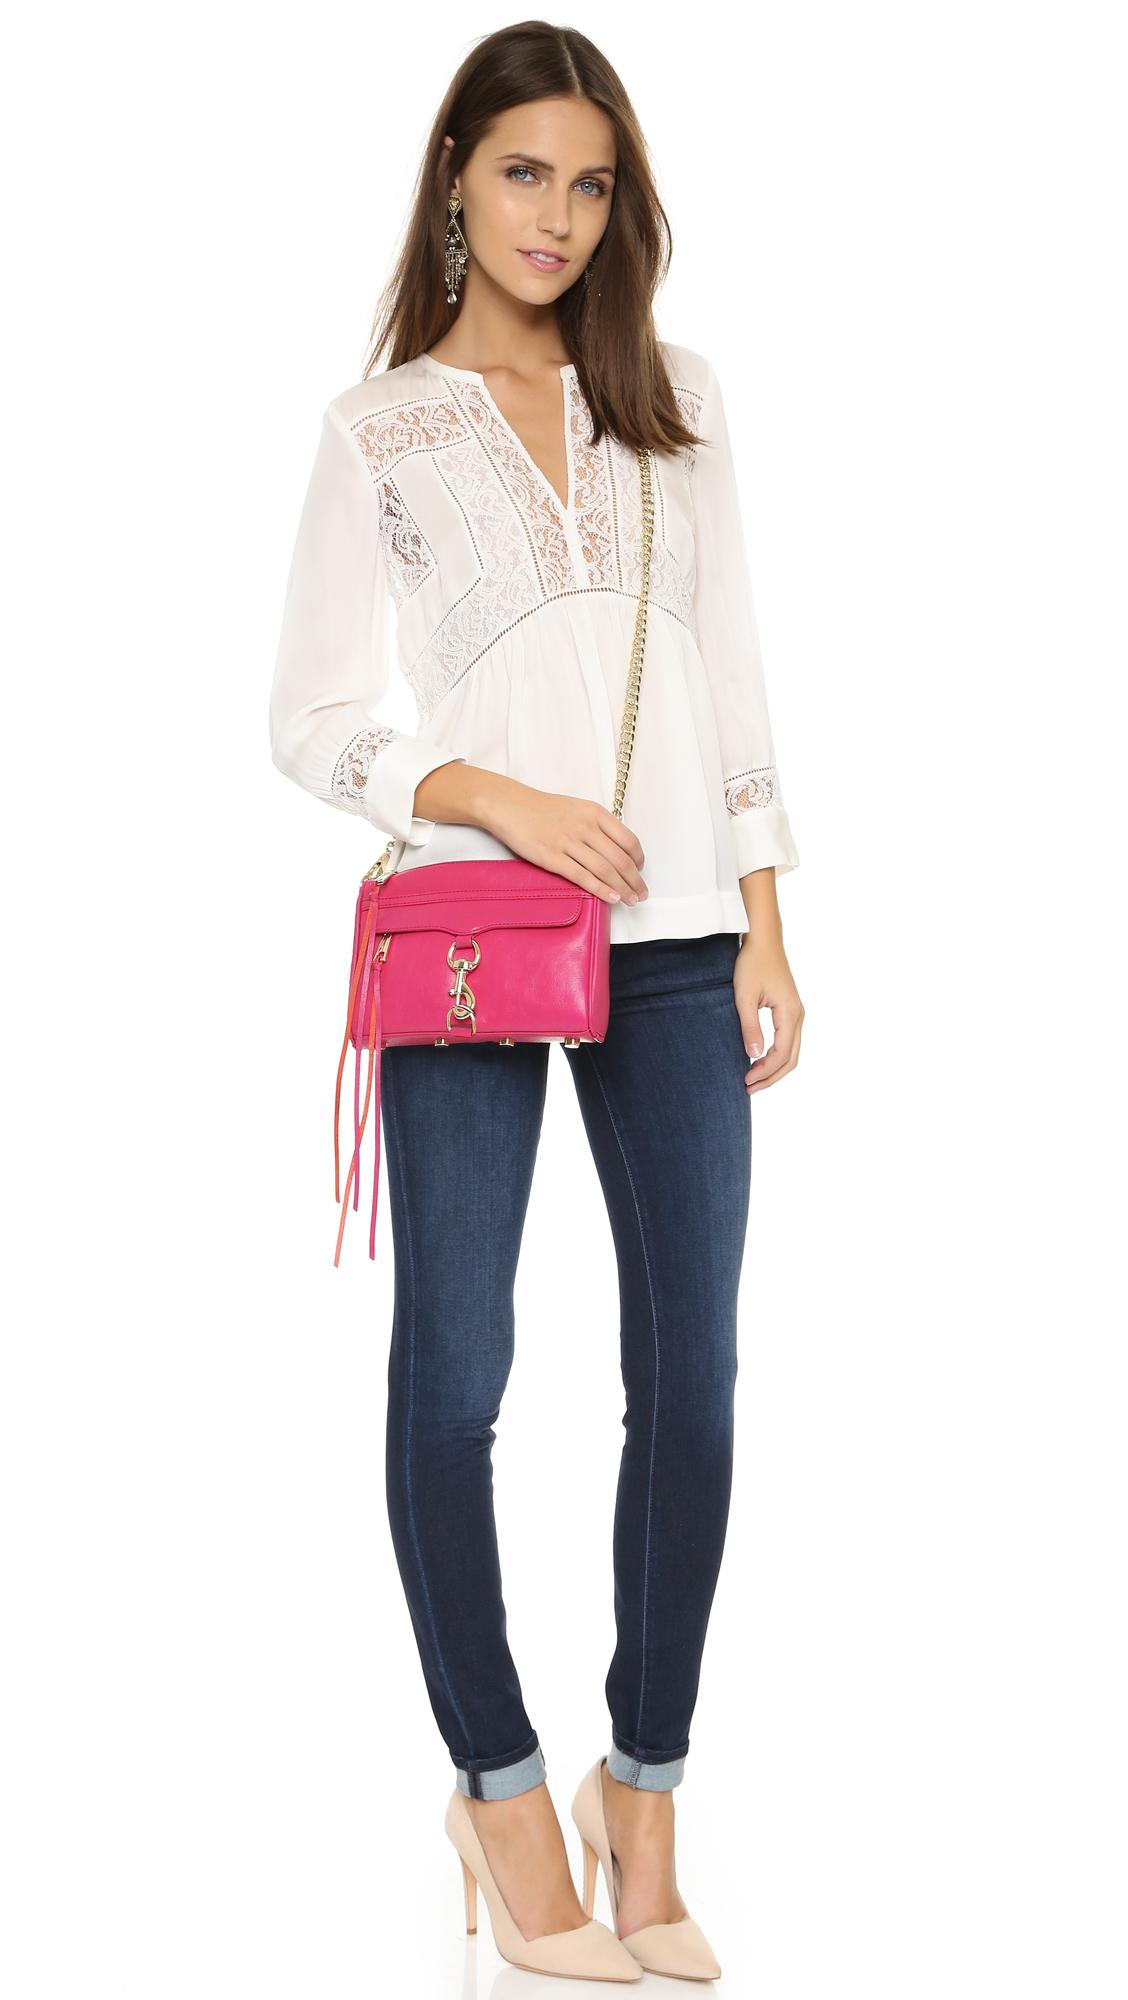 50c7eedfe871 Lyst - Rebecca Minkoff Mini Mac Cross Body Bag - Bright Fuchsia in Pink